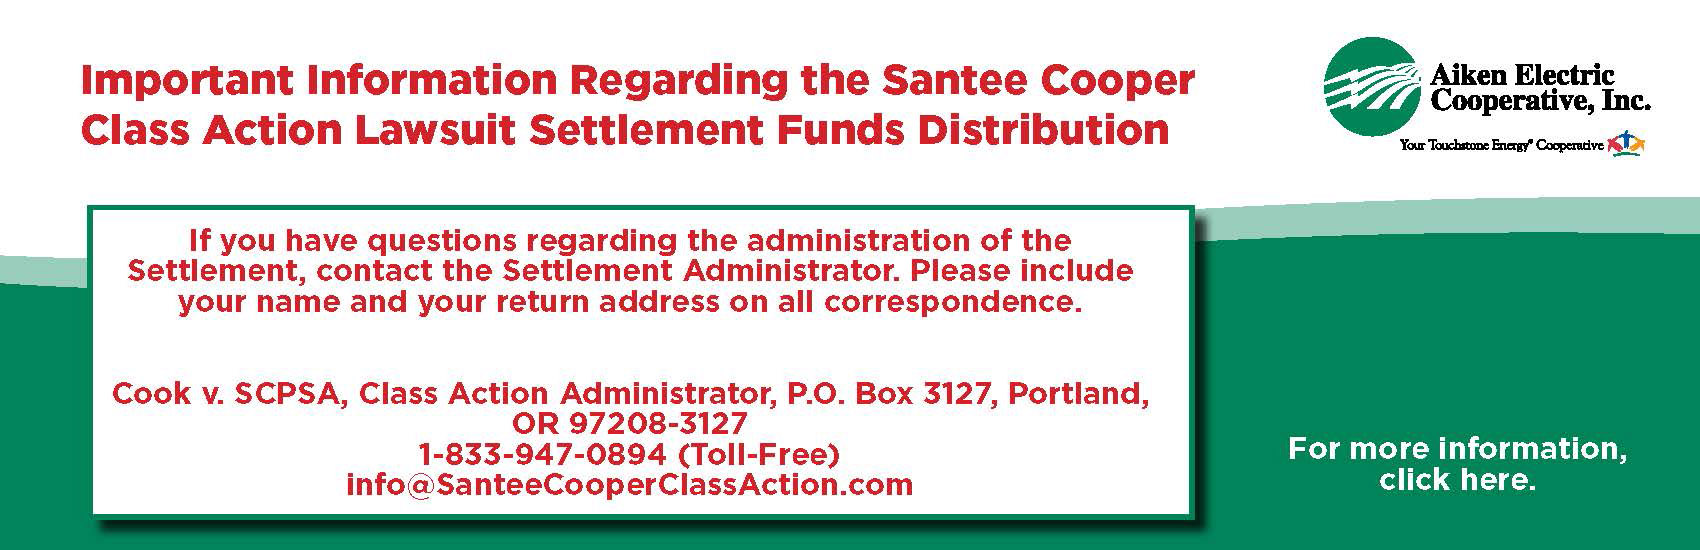 Santee Cooper Class Action Lawsuit information